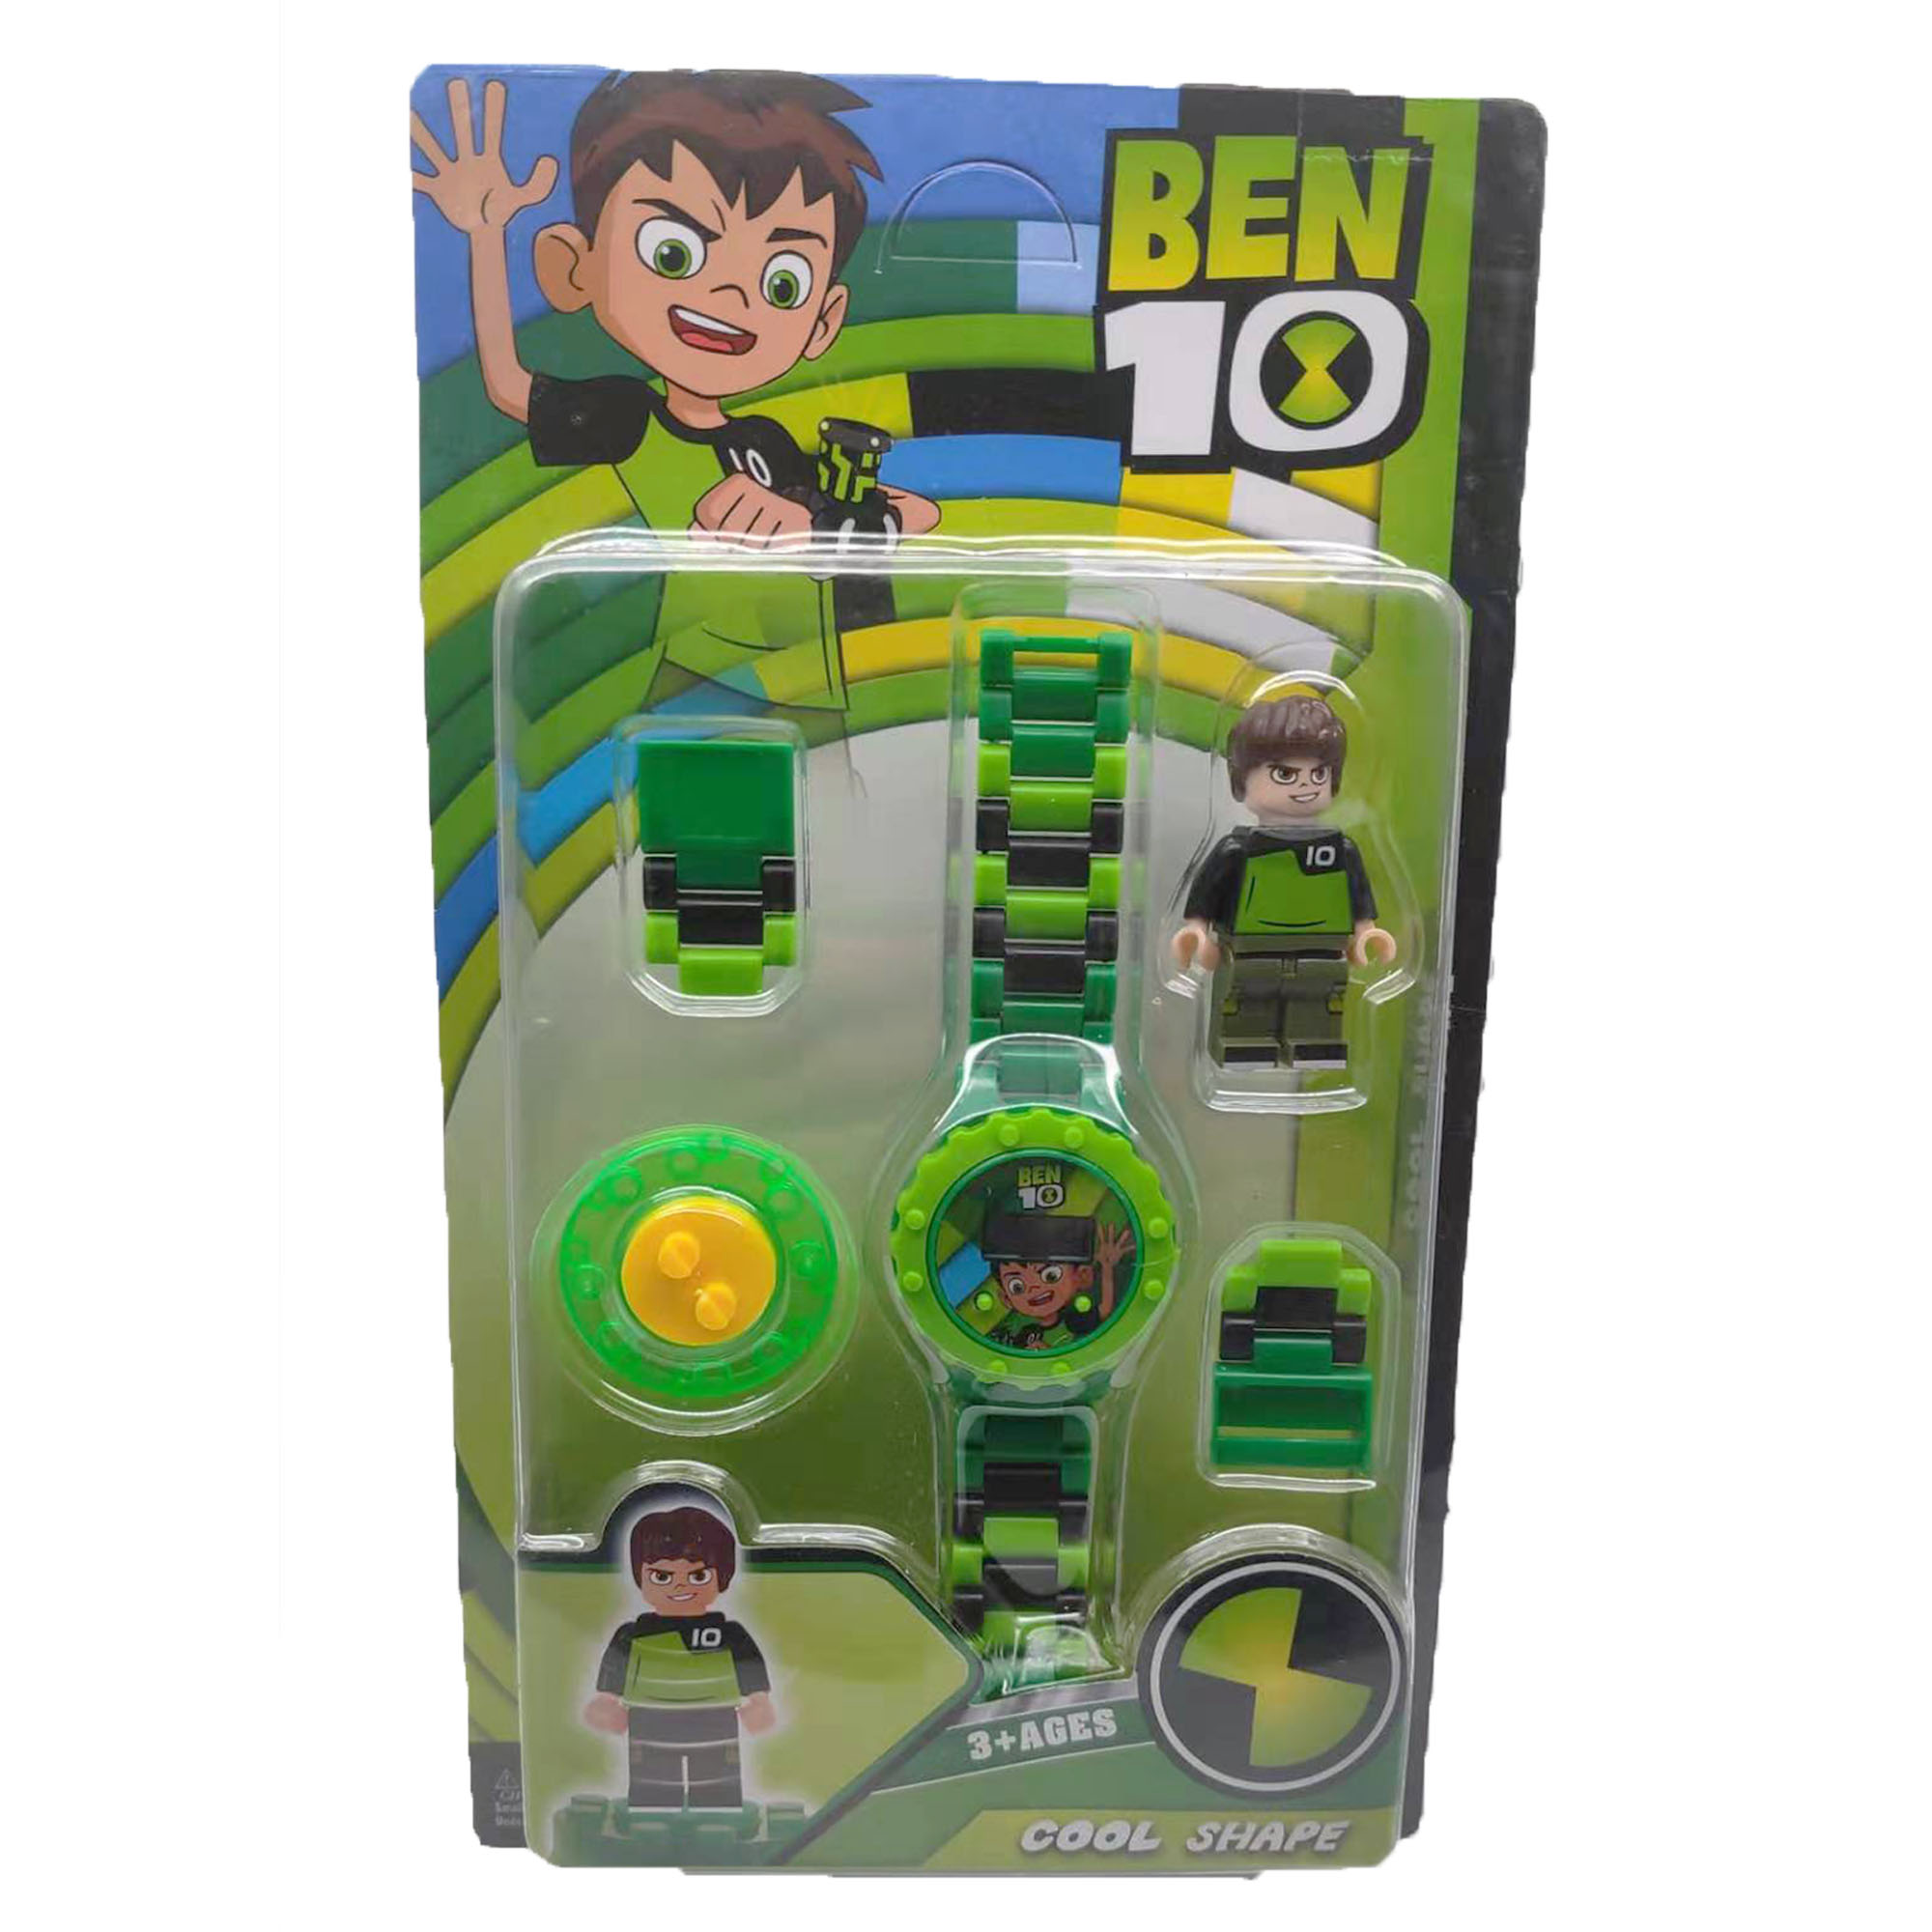 Dzen Time Best Deals Best Gift Digital Watch For Kids Action Figure Hero Lego Watch New Arrival Kid Kiddo Alien Ten 10 Ben Cheap Sale Best Product For Kid K011 Lazada Ph